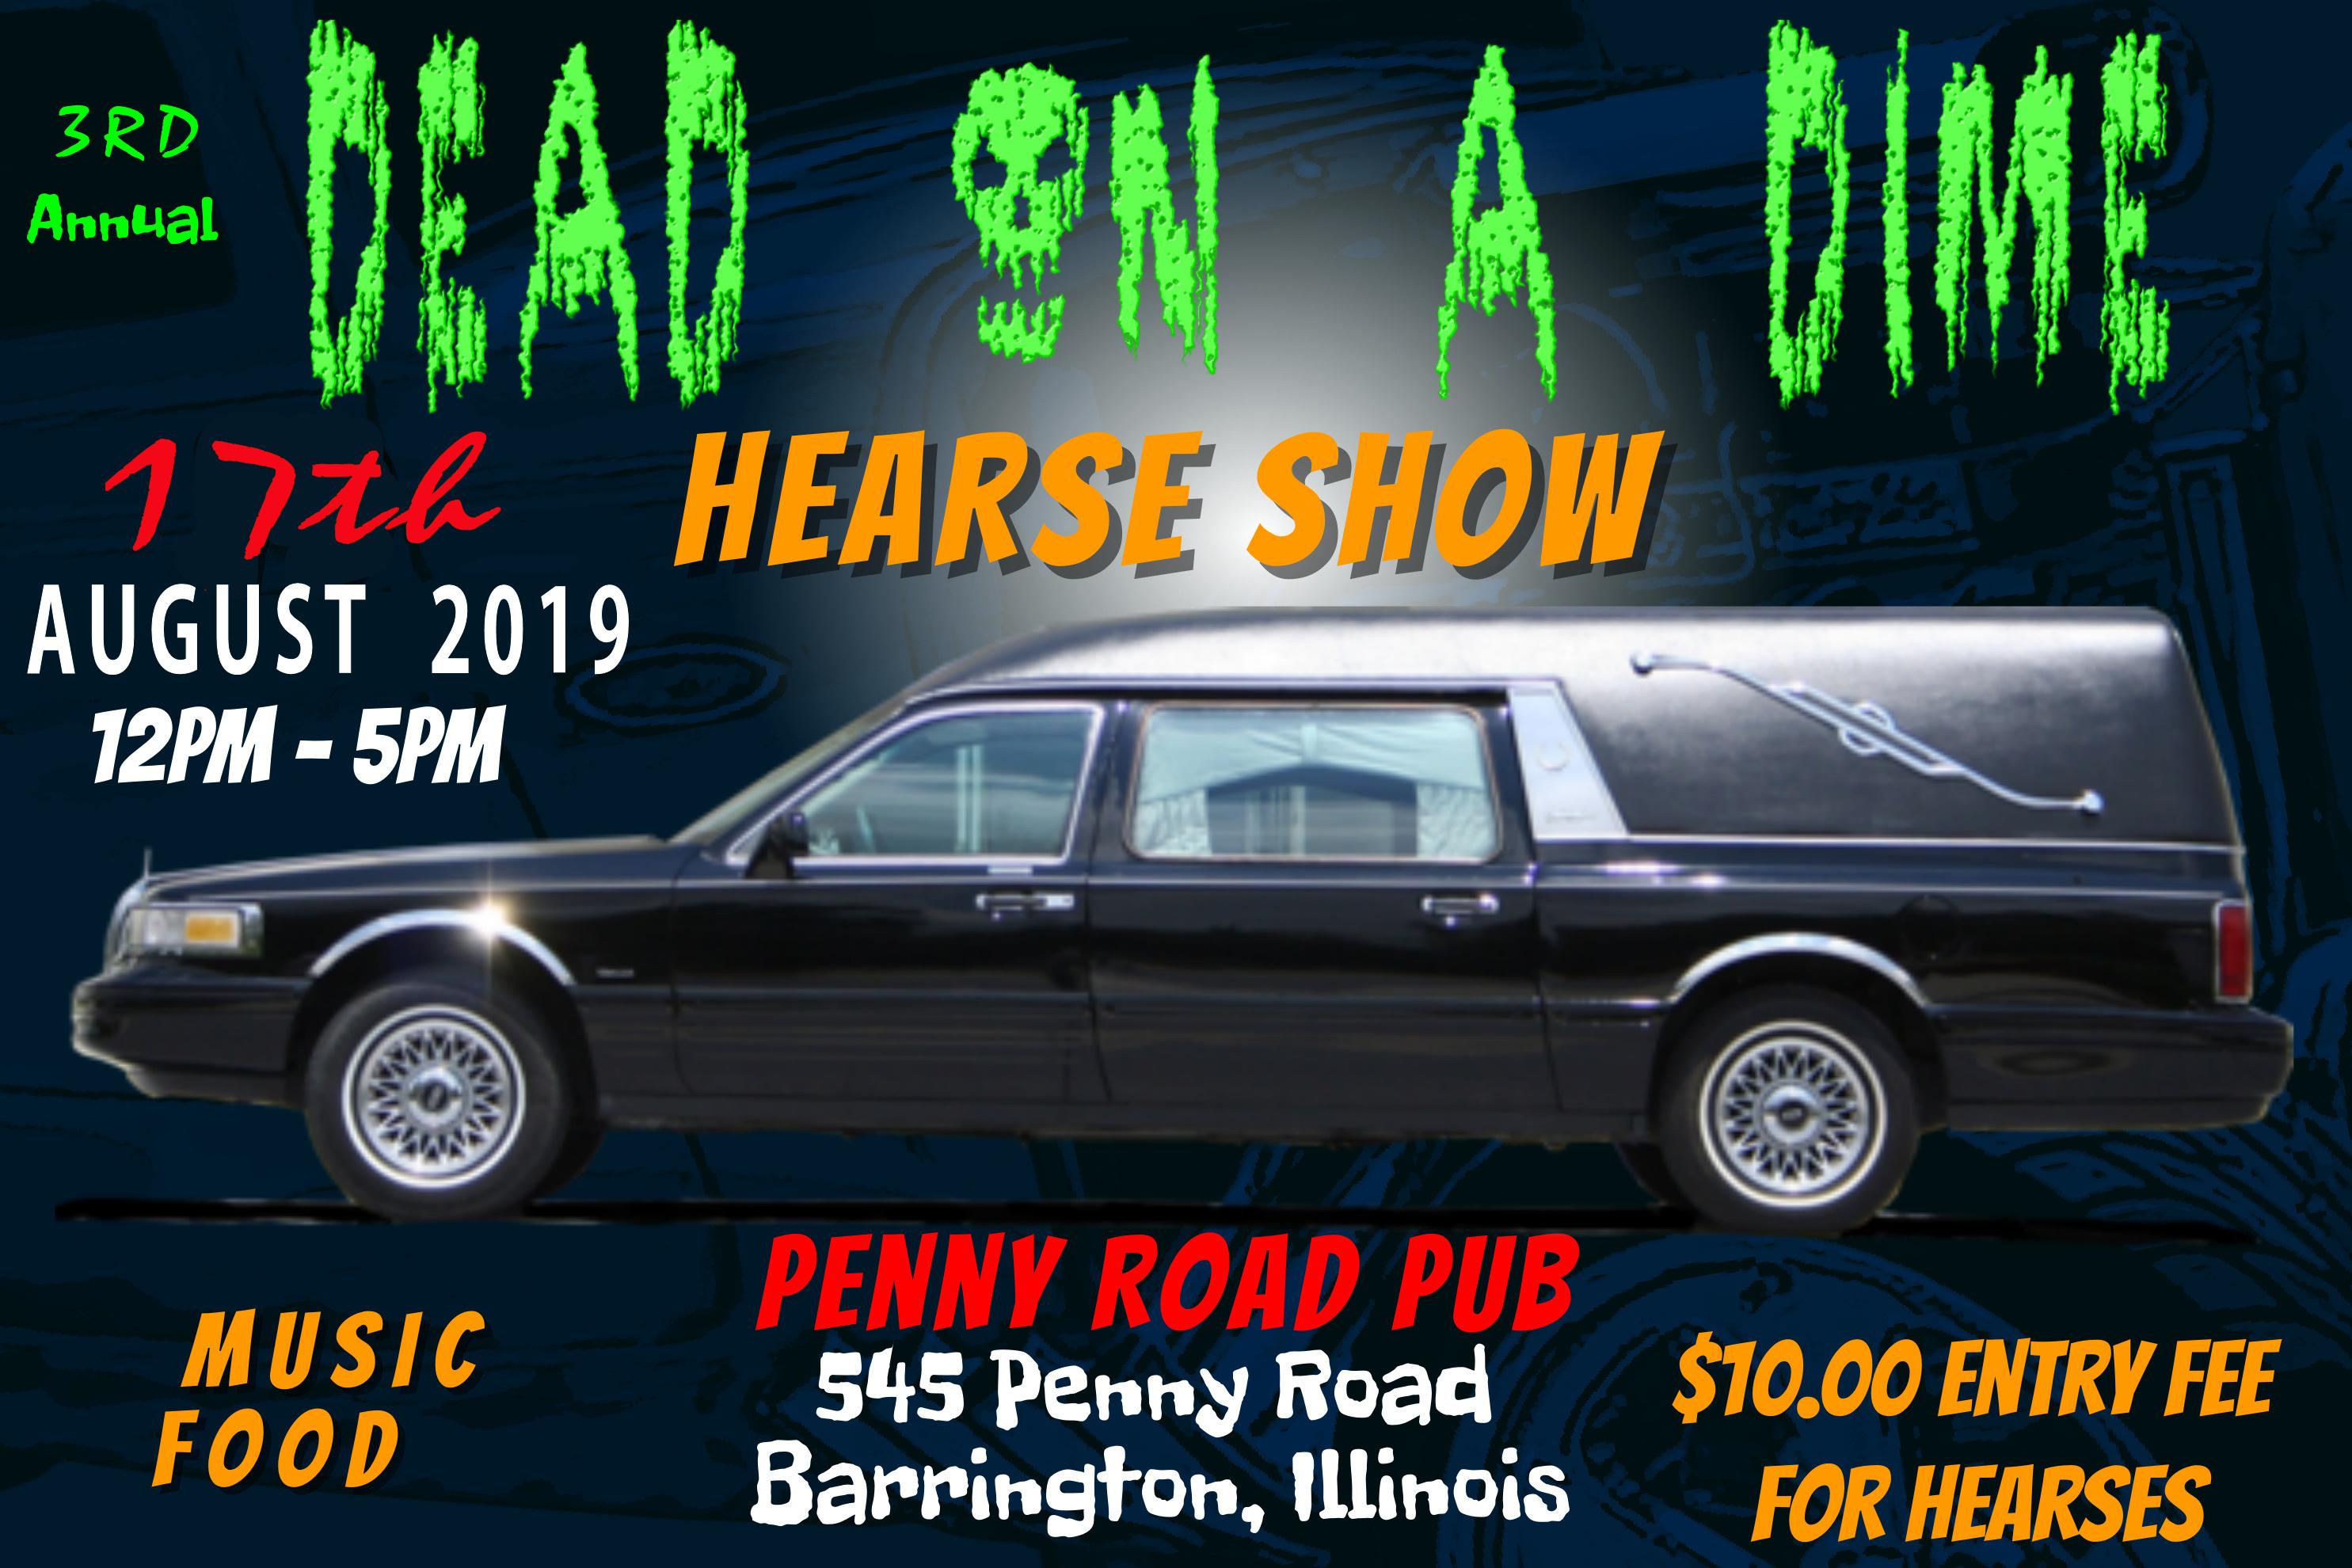 hearse show